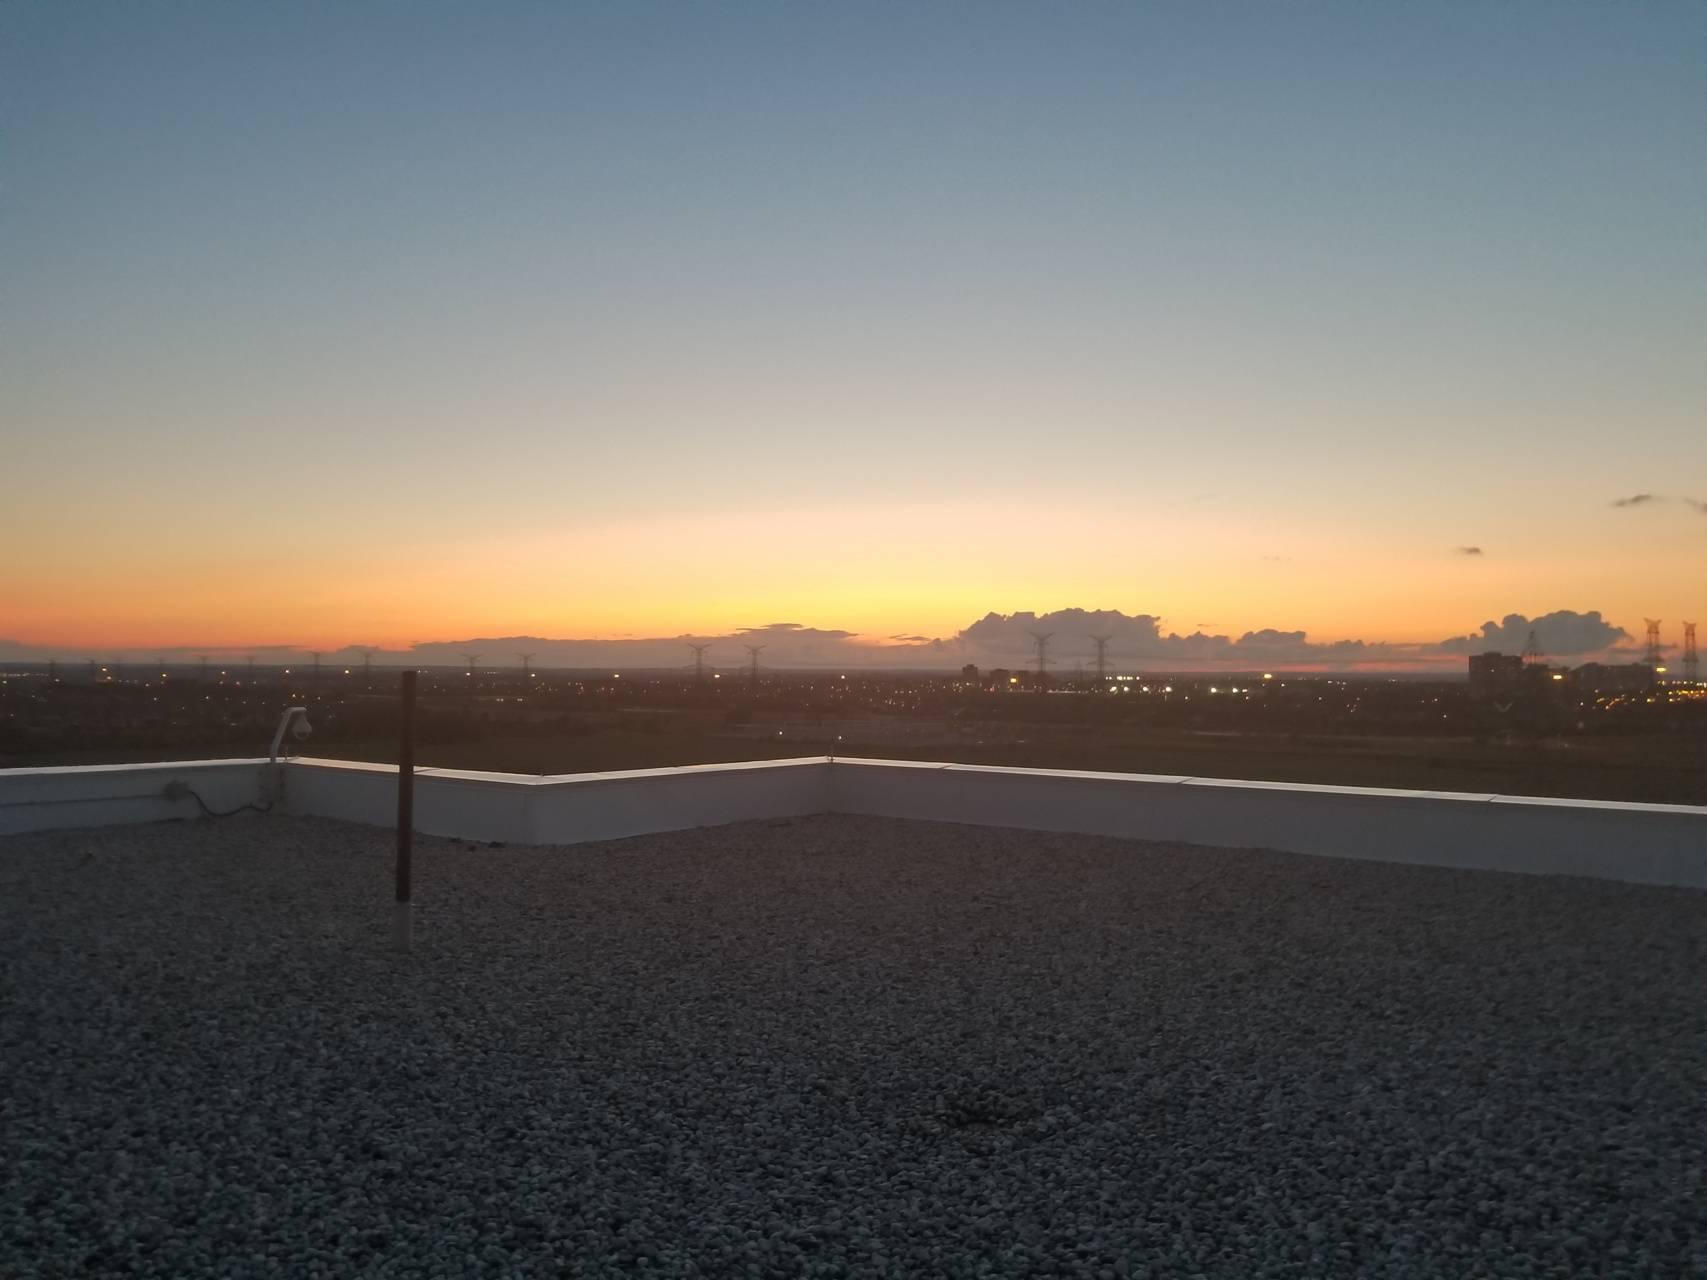 Brampton sunset